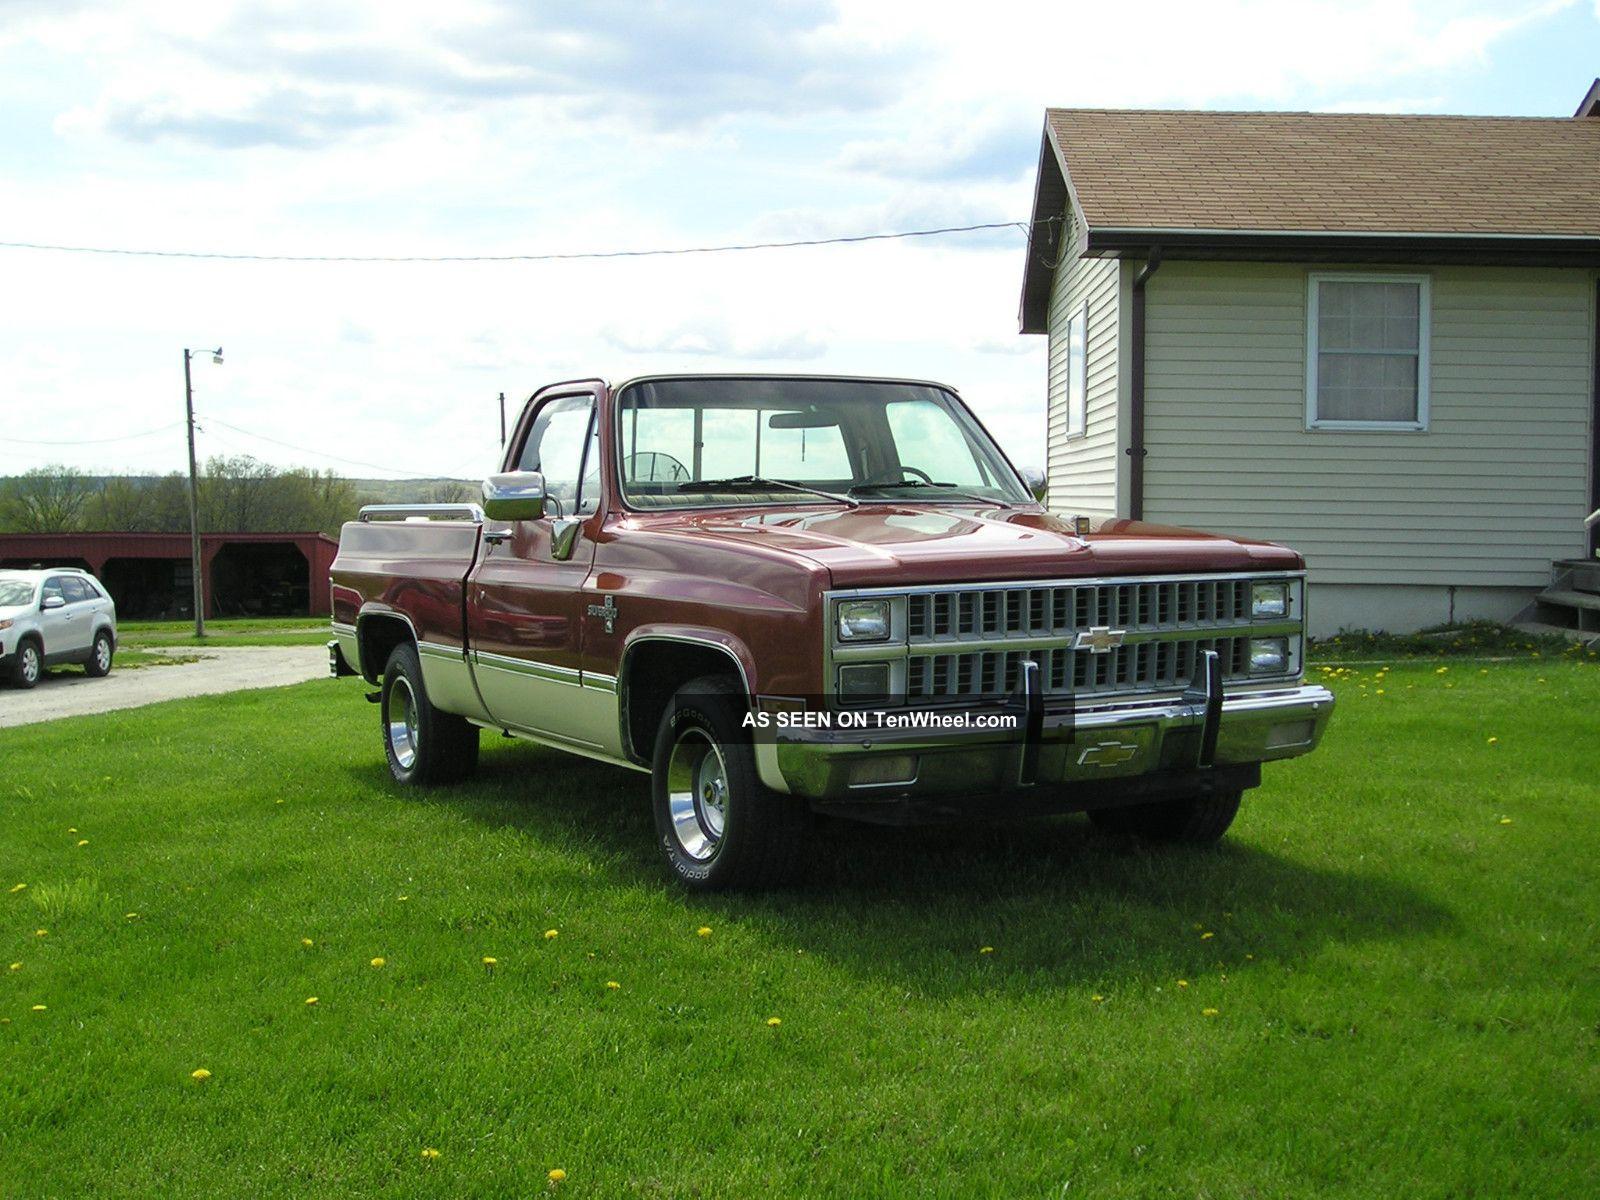 1982 Swb Chevrolet Silverado 64 65 66 67 71 72